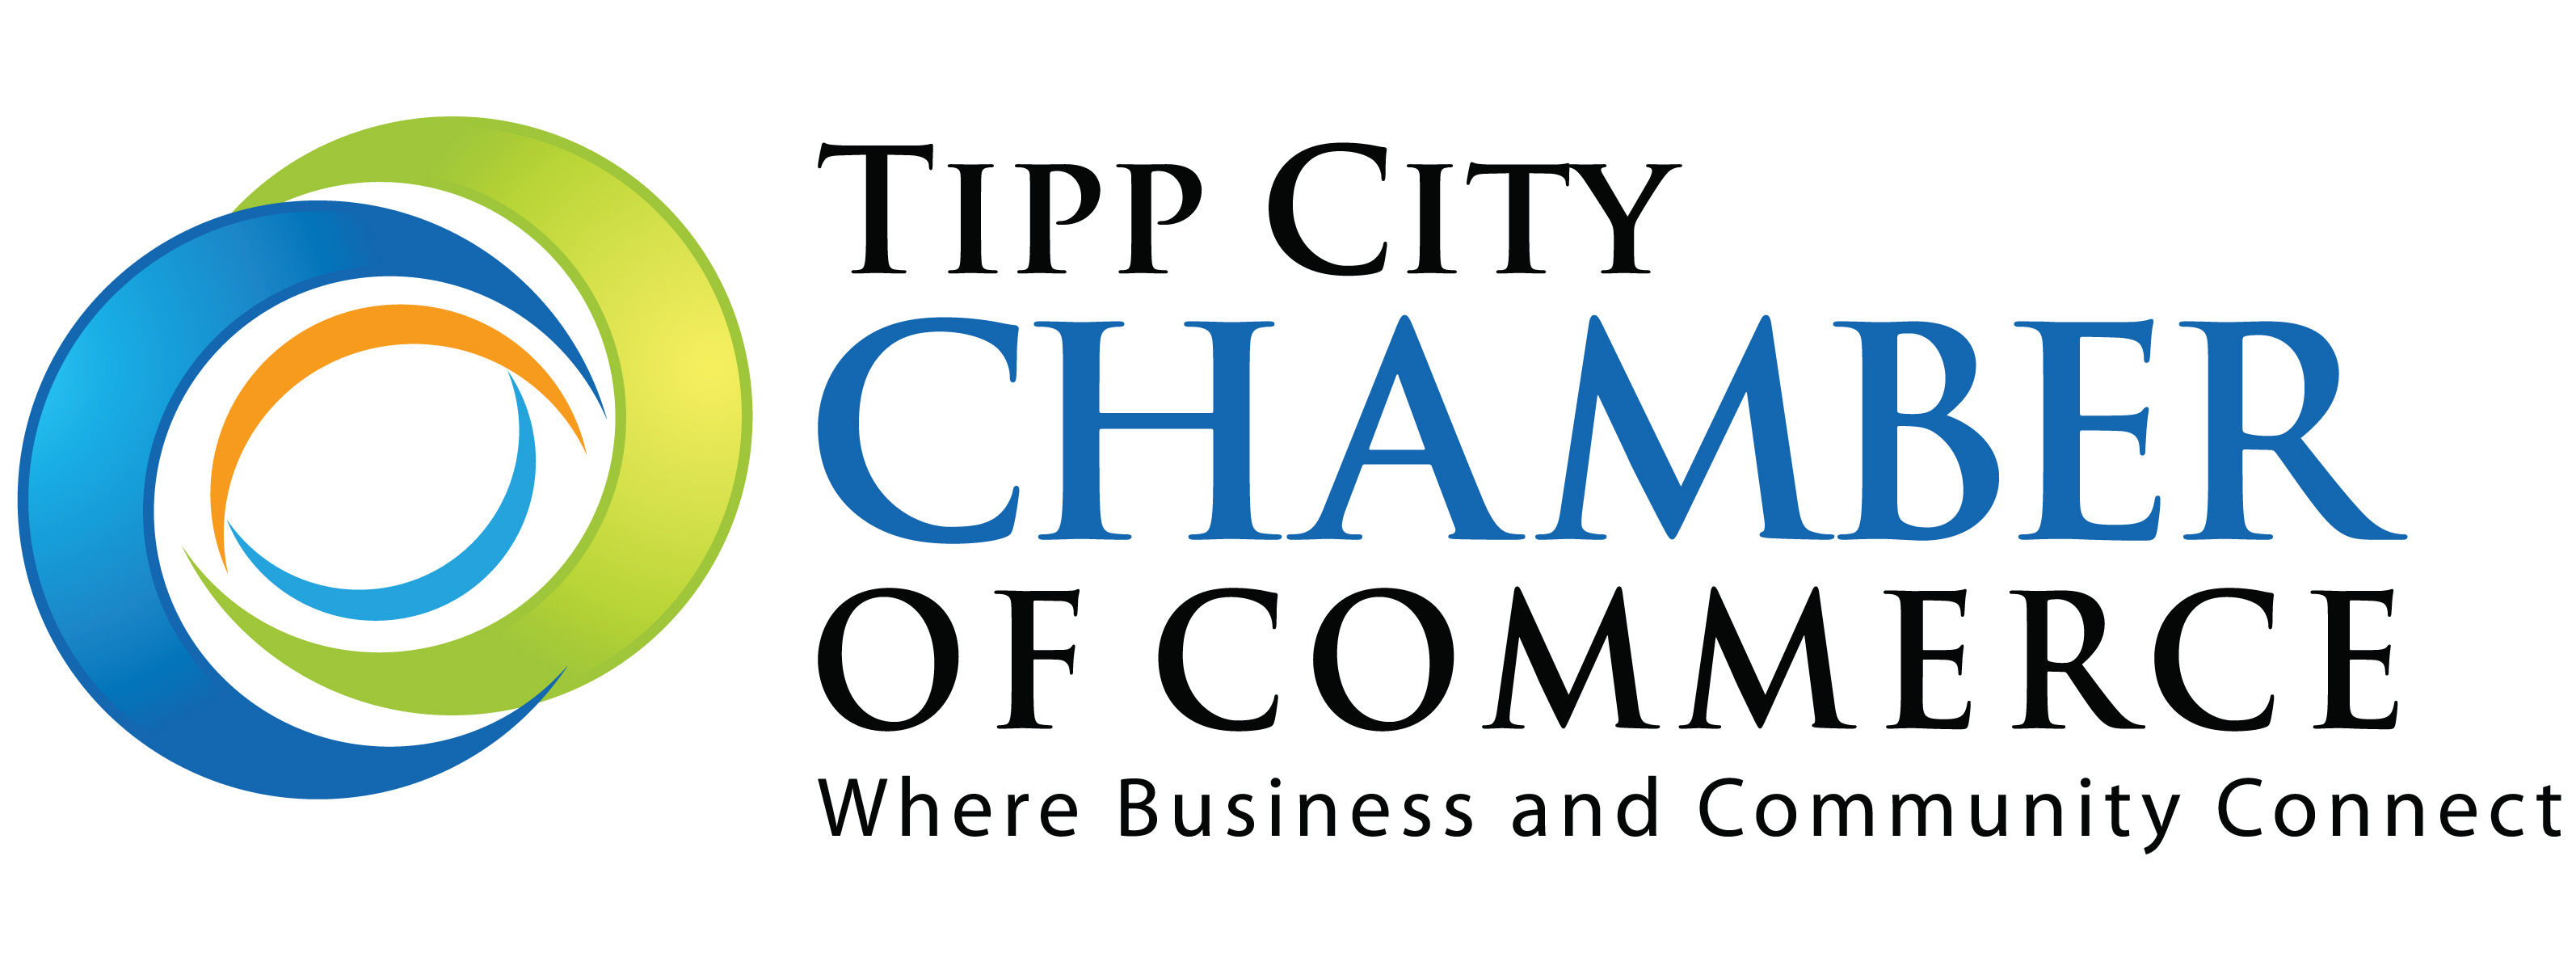 Tipp City logo